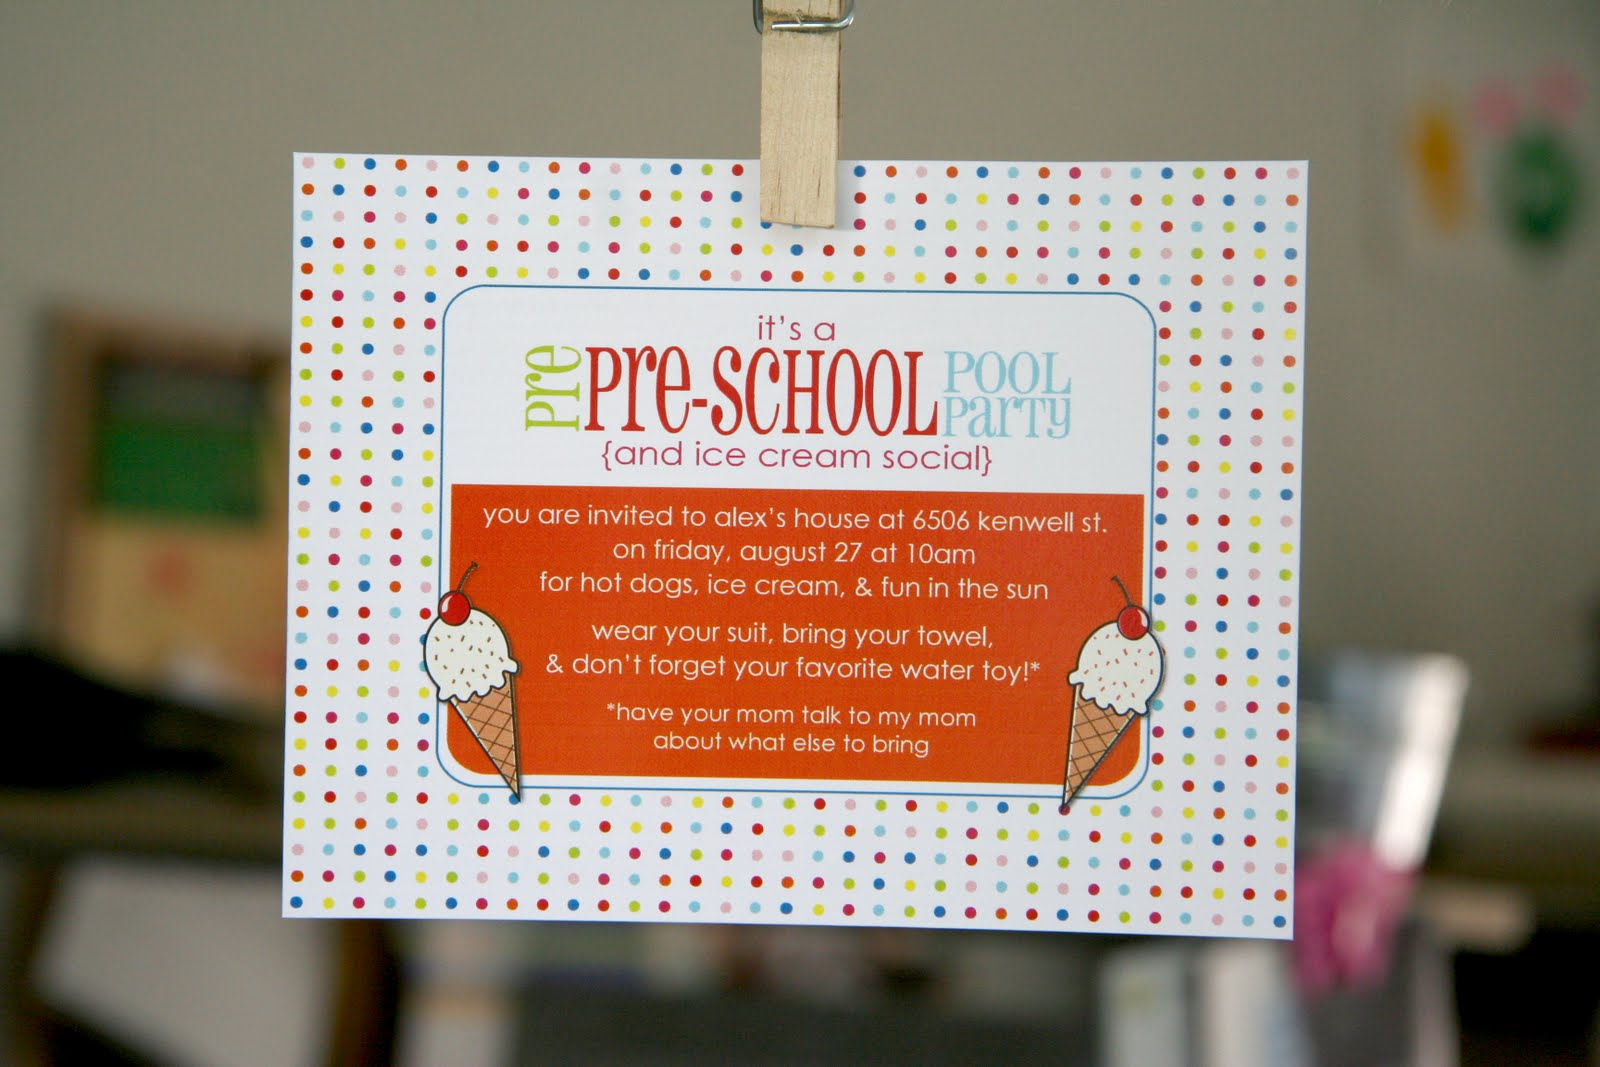 The Evans Family: Pre-Preschool Pool Party & Ice Cream Social